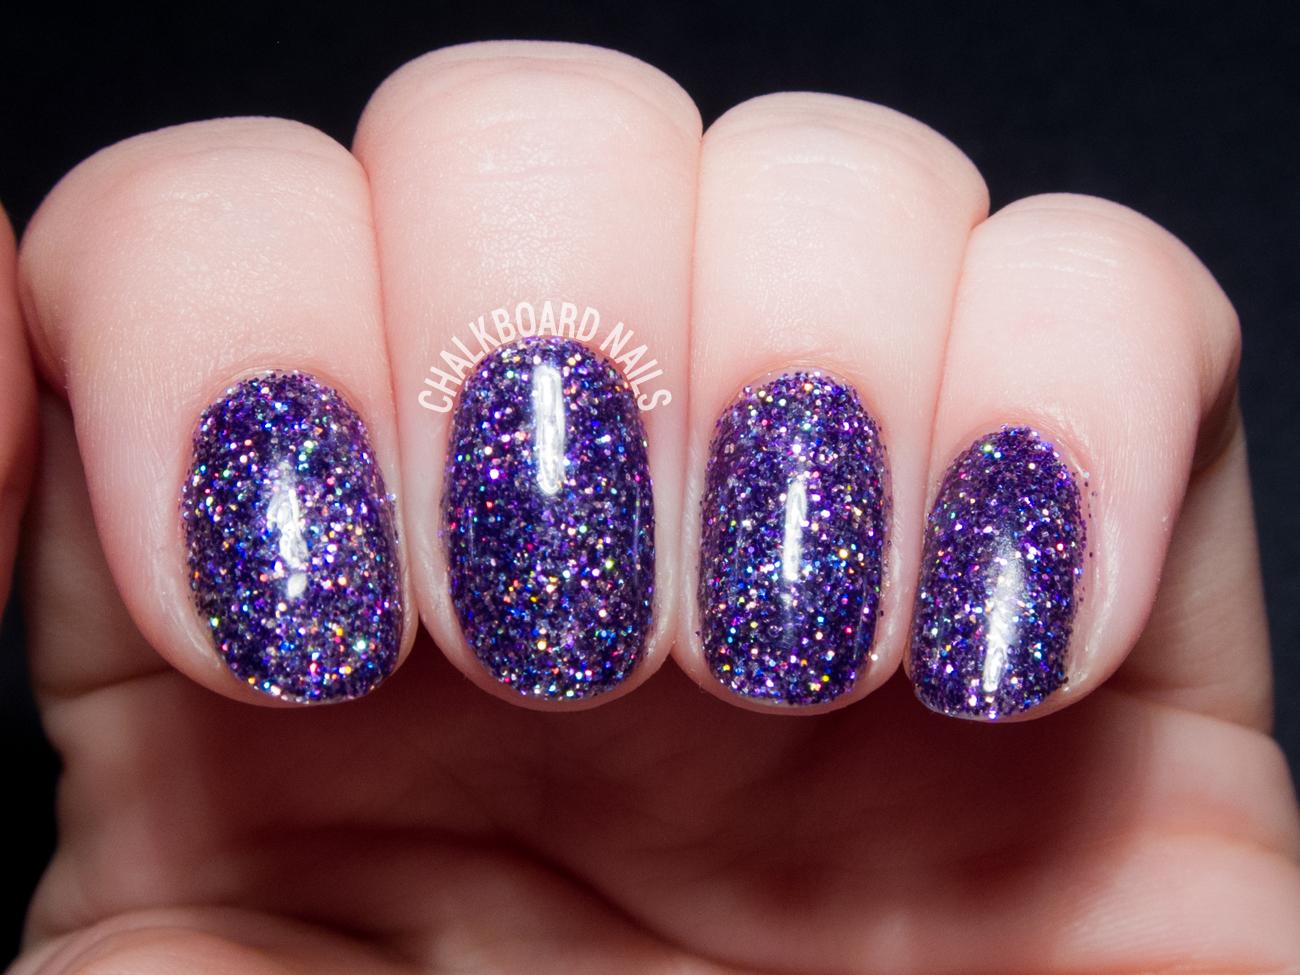 rockstar gel nails photo - 1